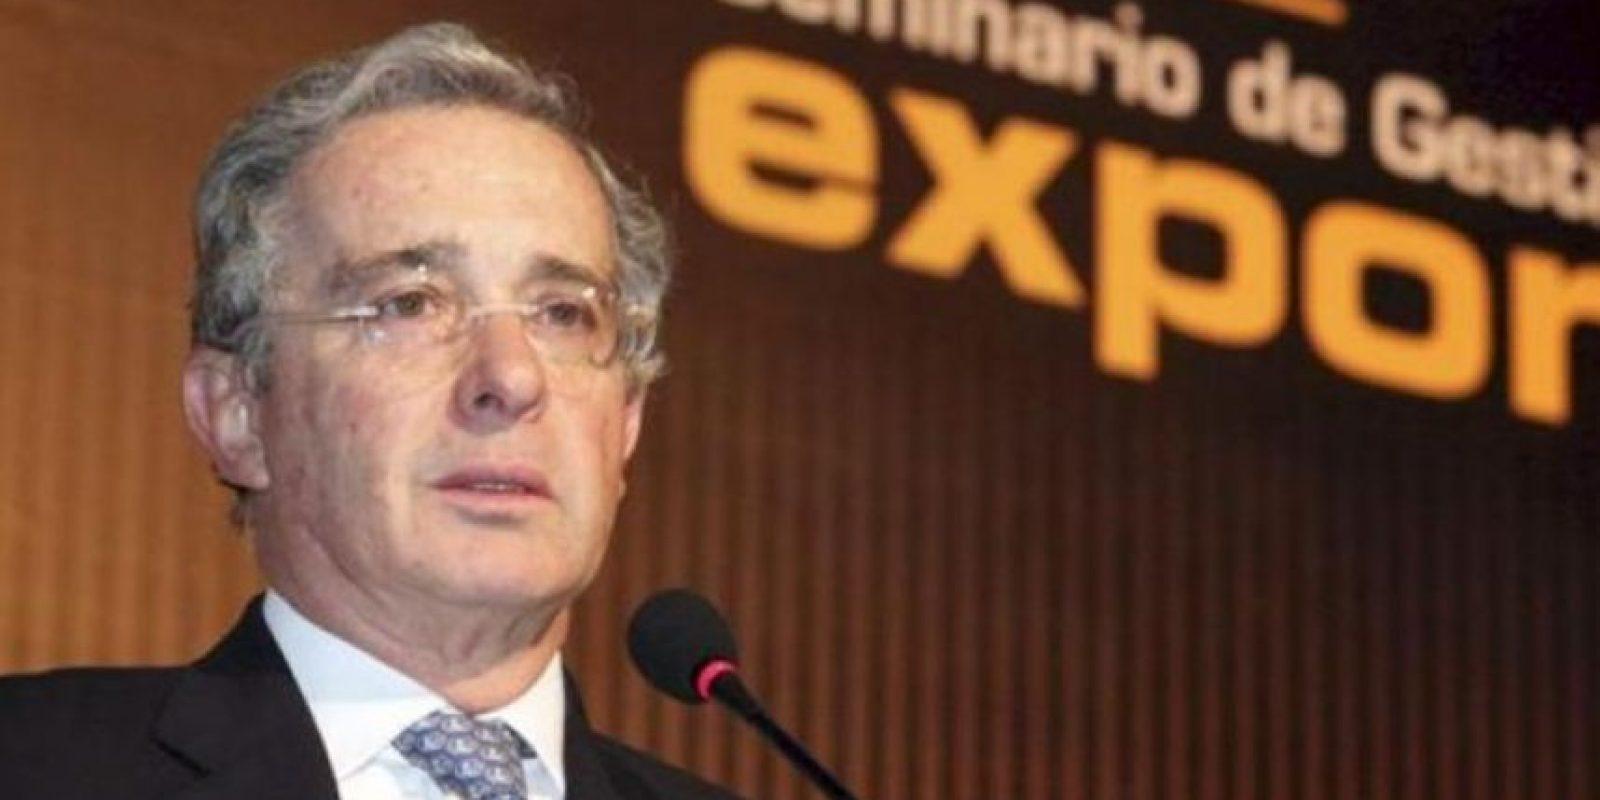 El senador Álvaro Uribe Vélez publicó un titular falso en Twitter Foto:Archivo Publimetro